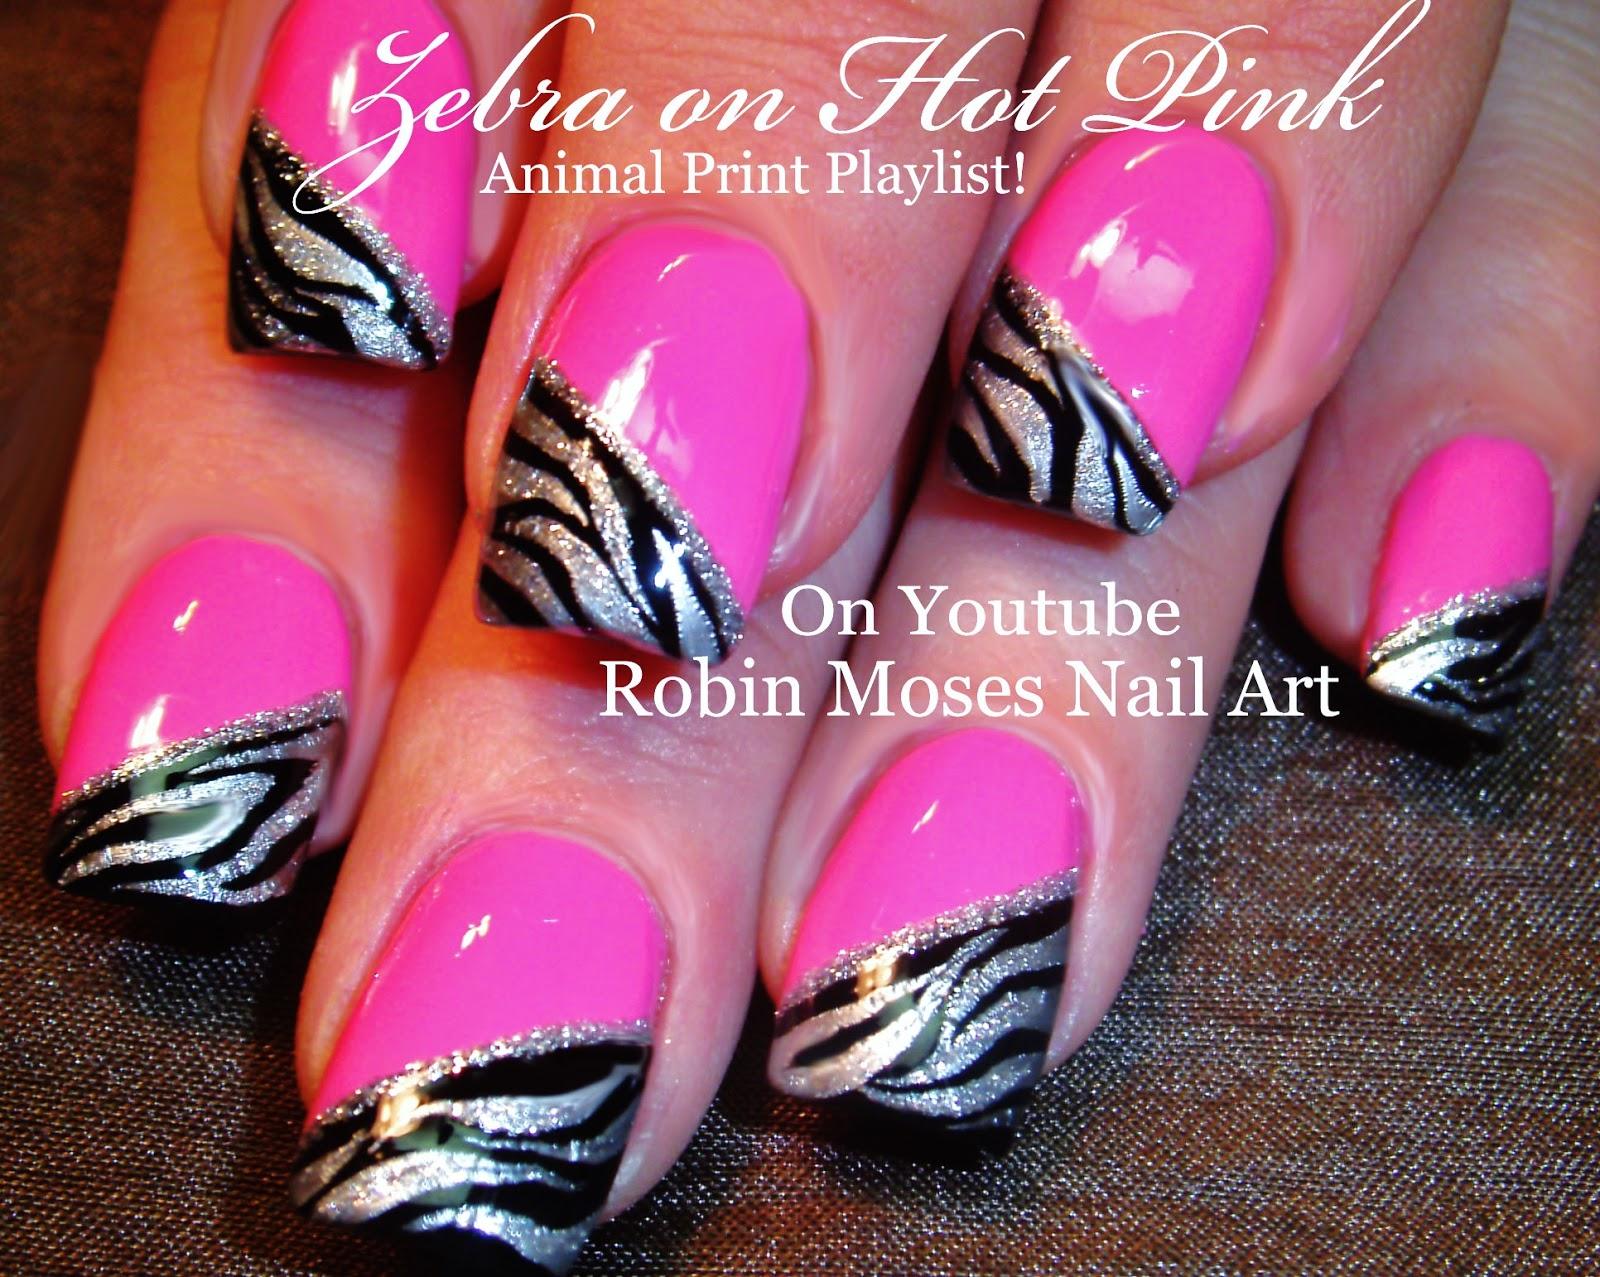 Nail Art by Robin Moses: Hot Pink Nails with Black and